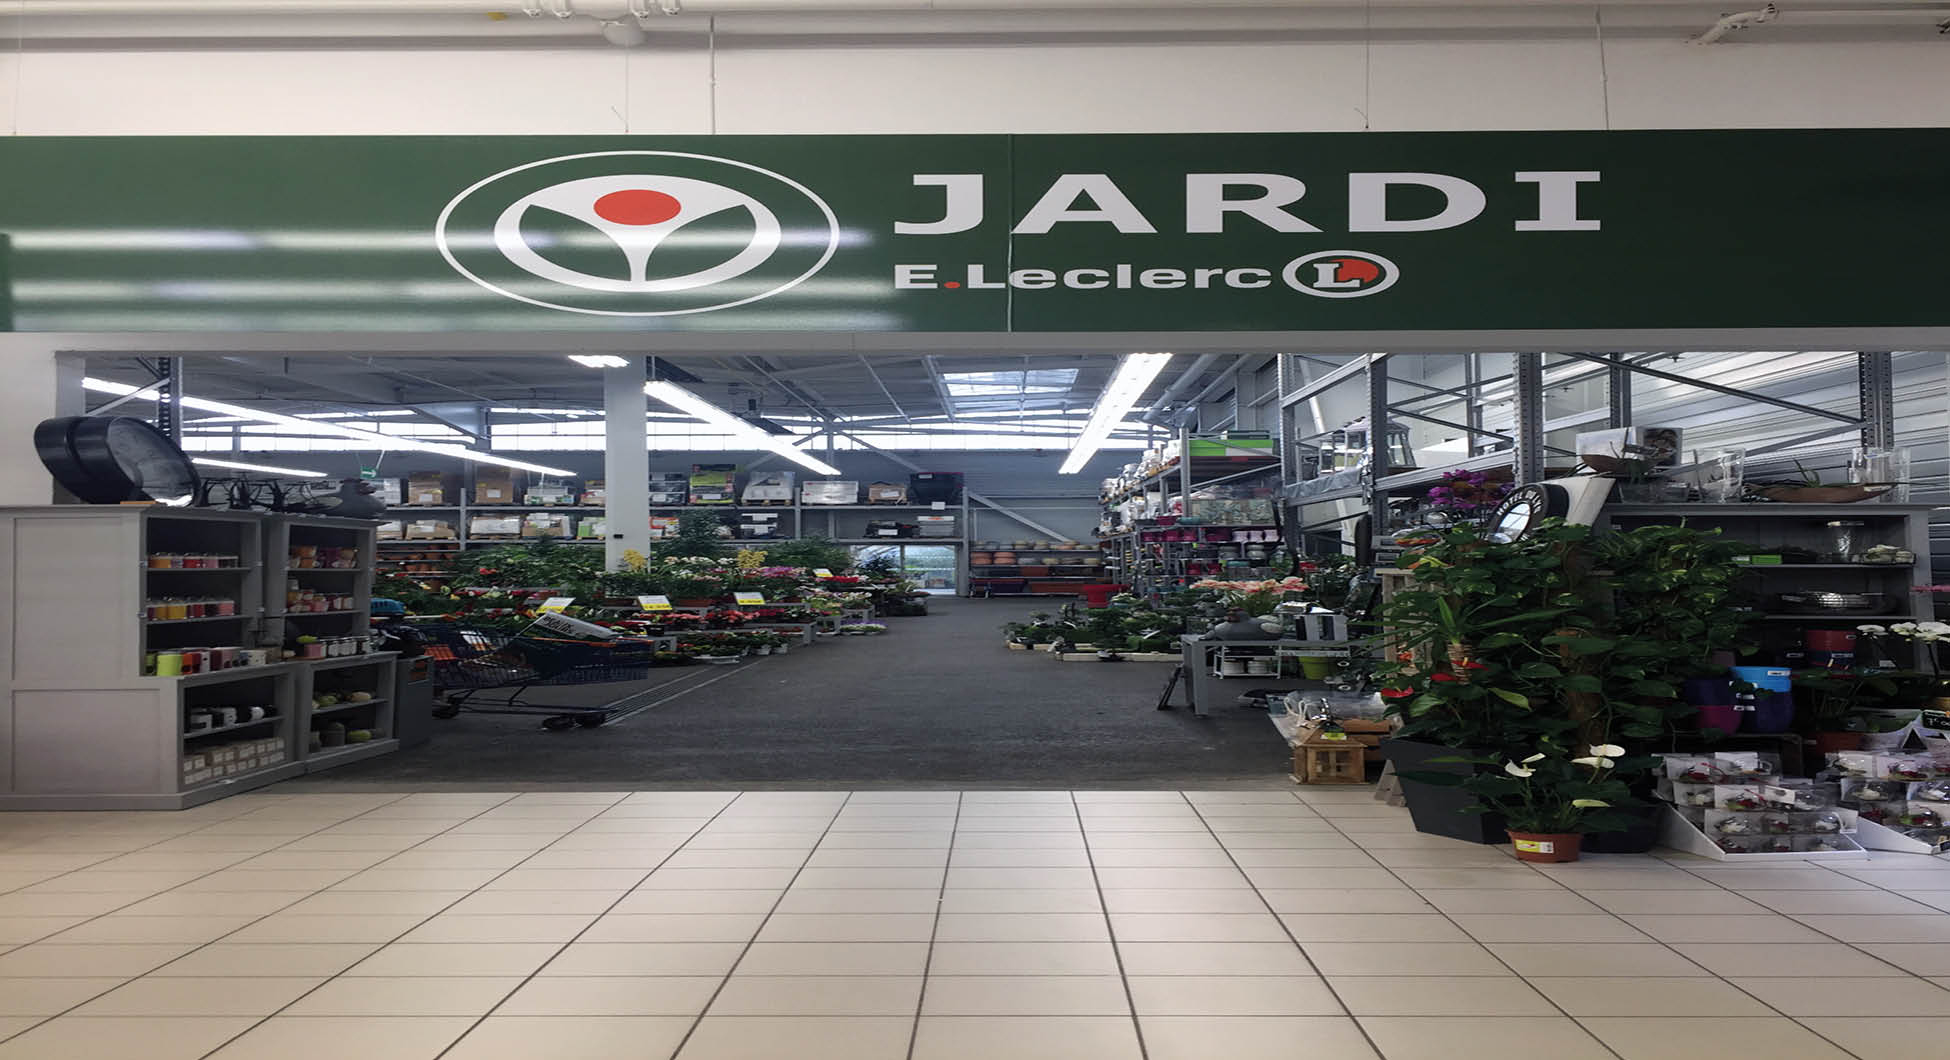 E.leclerc Rochefort Sur Mer - Rochefort - Jardi serapportantà Abri De Jardin E Leclerc